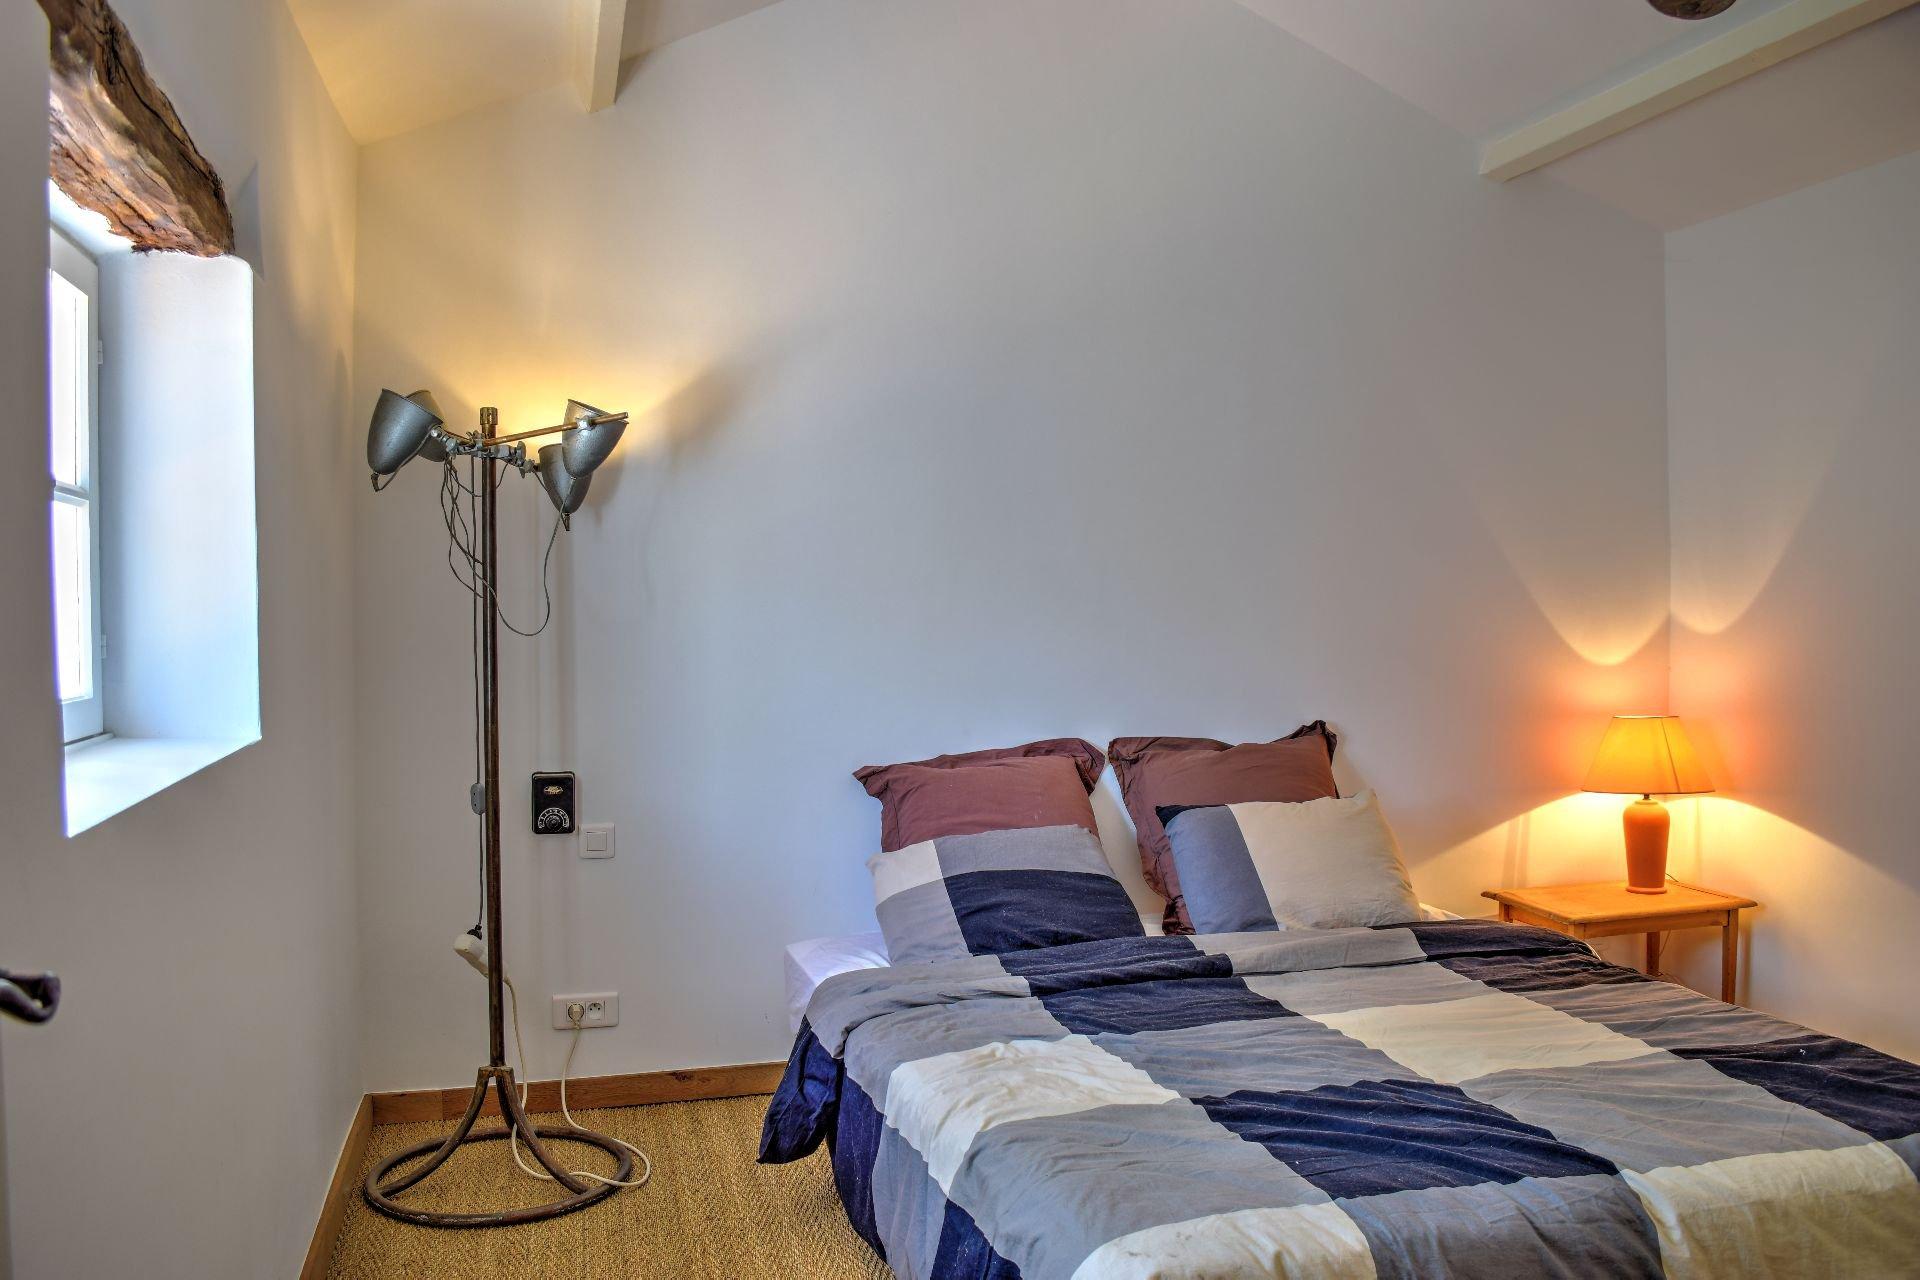 First floor bedroom, Lorgues, Var, Provence